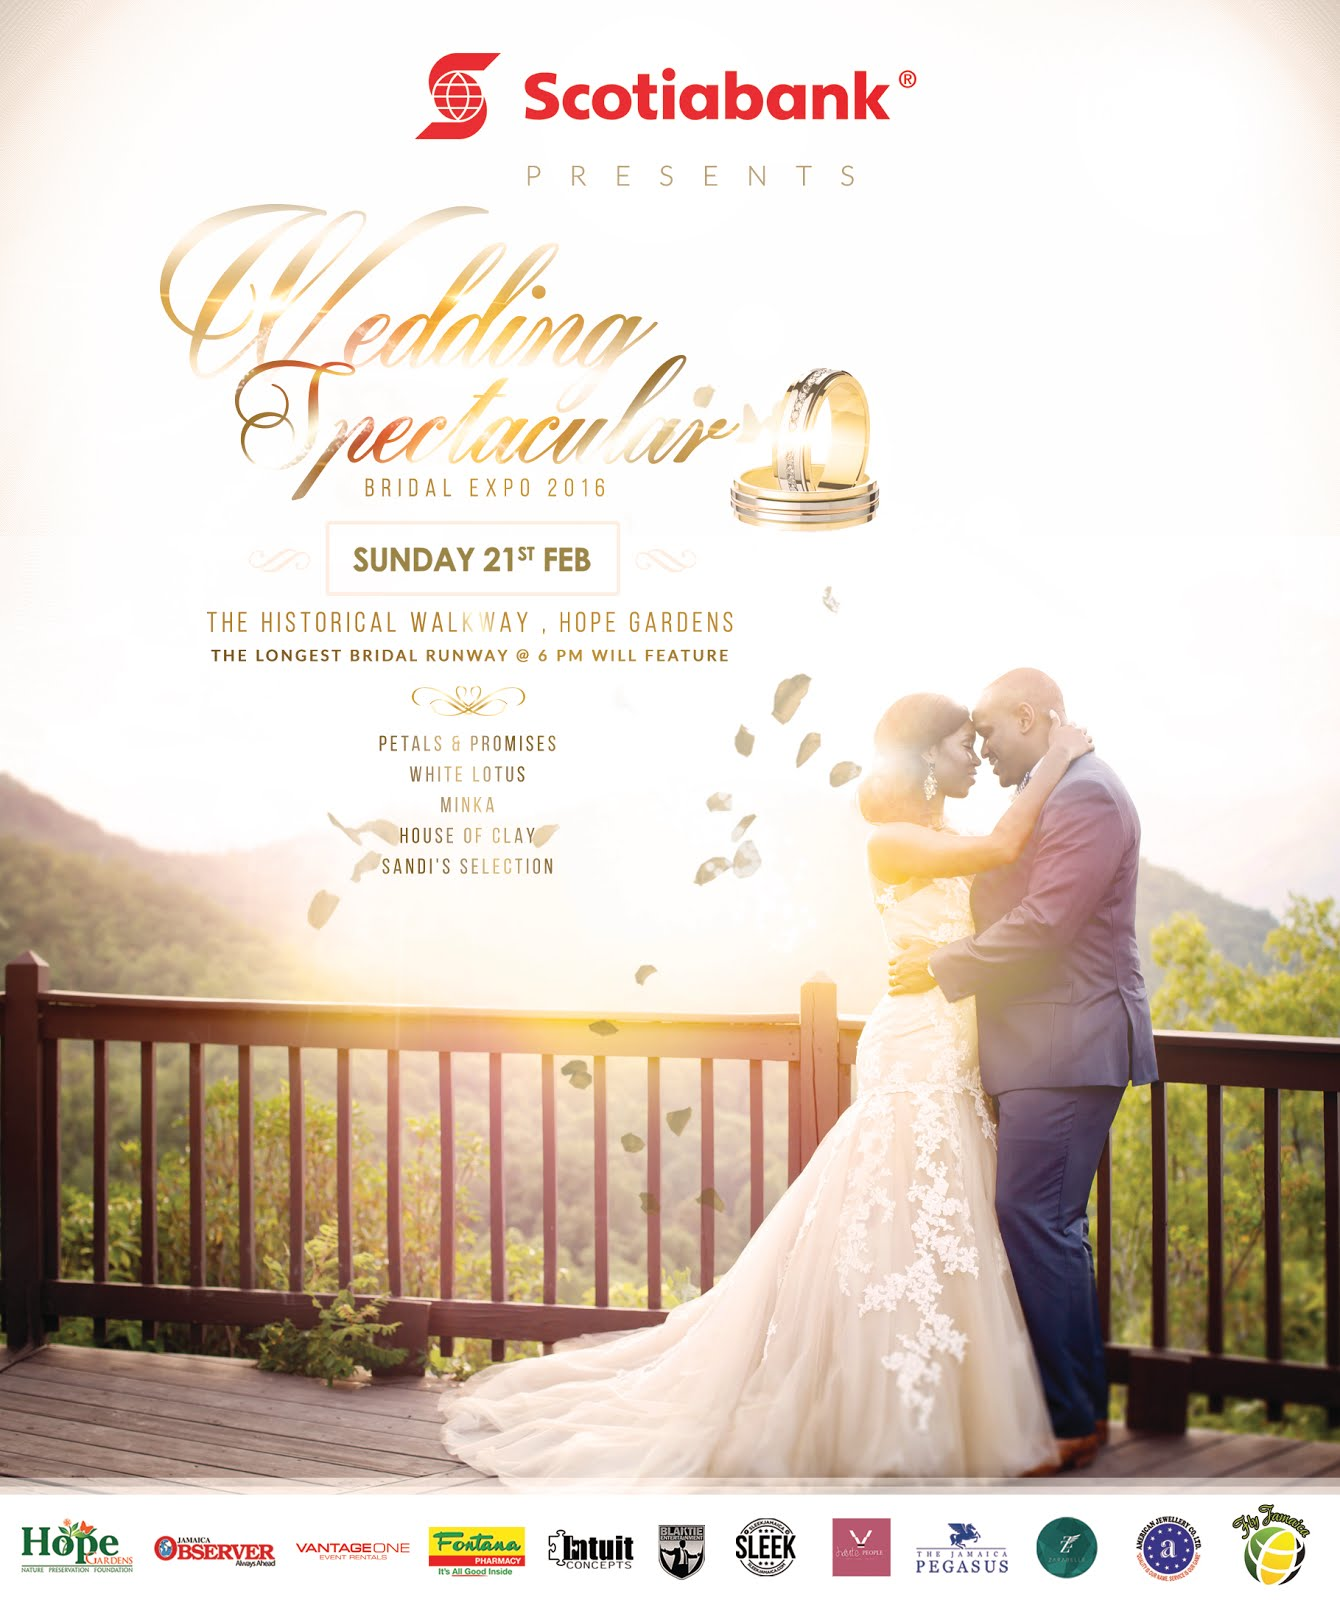 Wedding Spectacular 2016